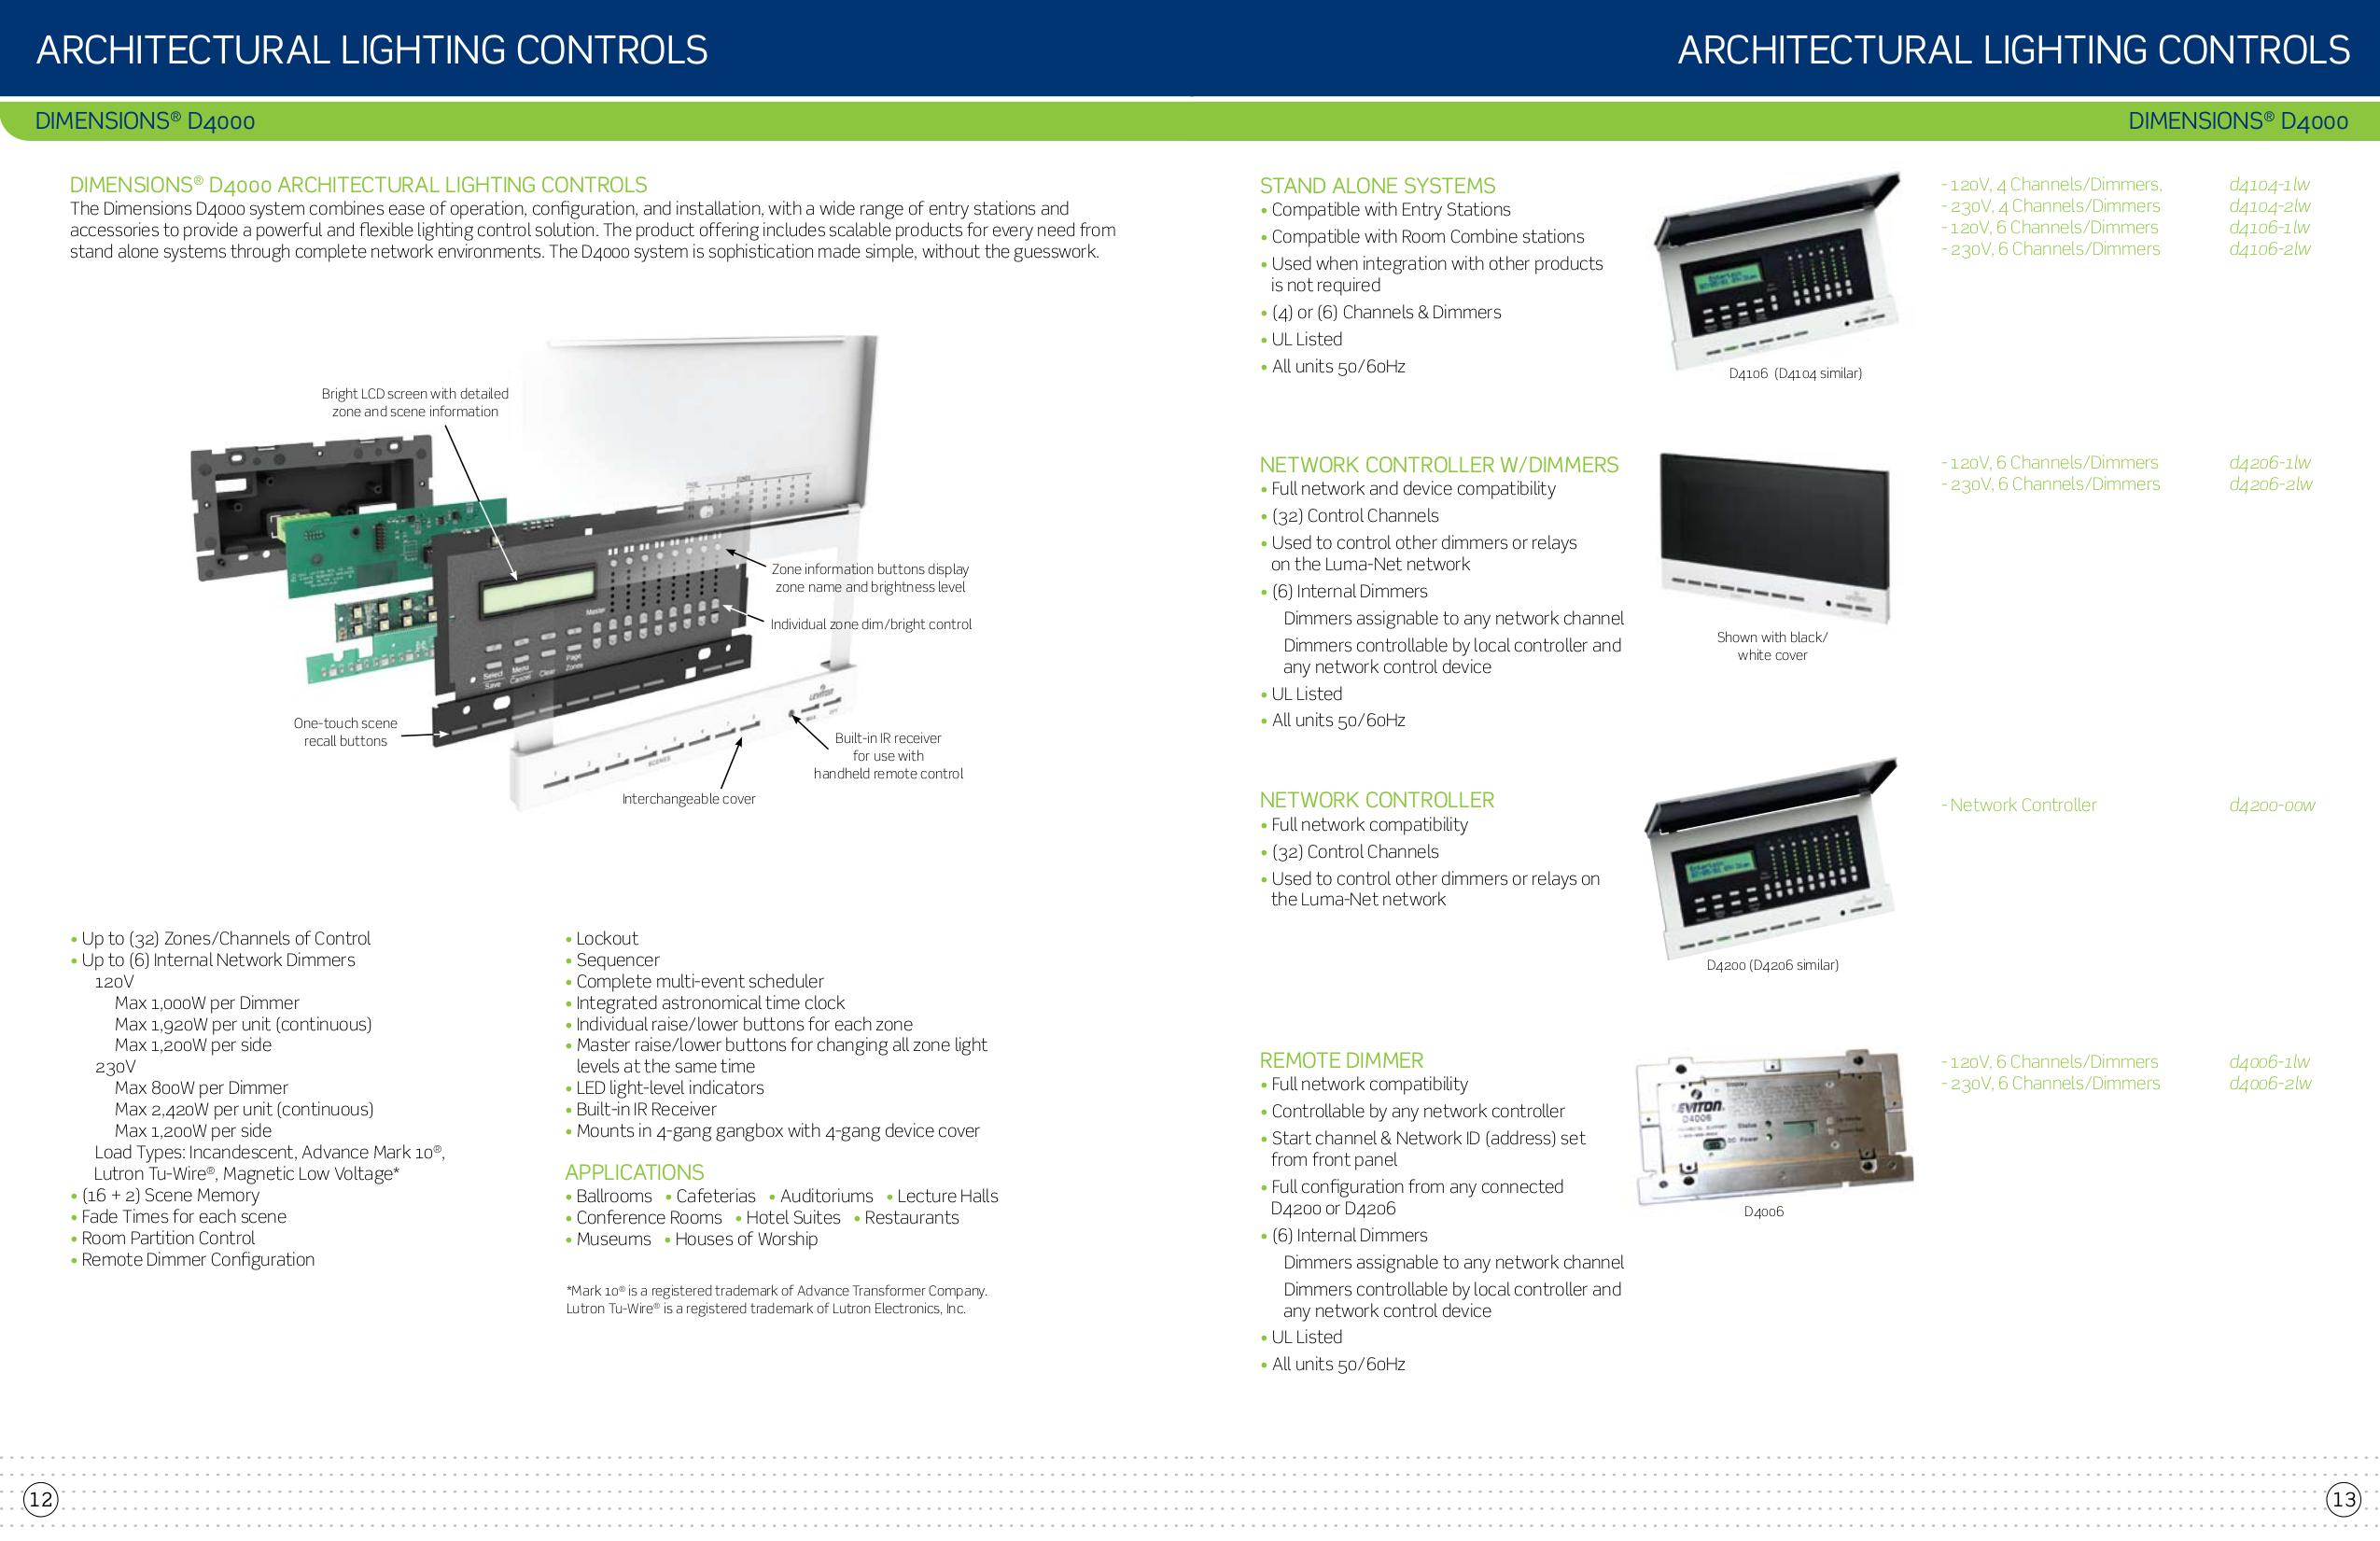 Awesome Leviton Controls Photos - Wiring Diagram Ideas - blogitia.com